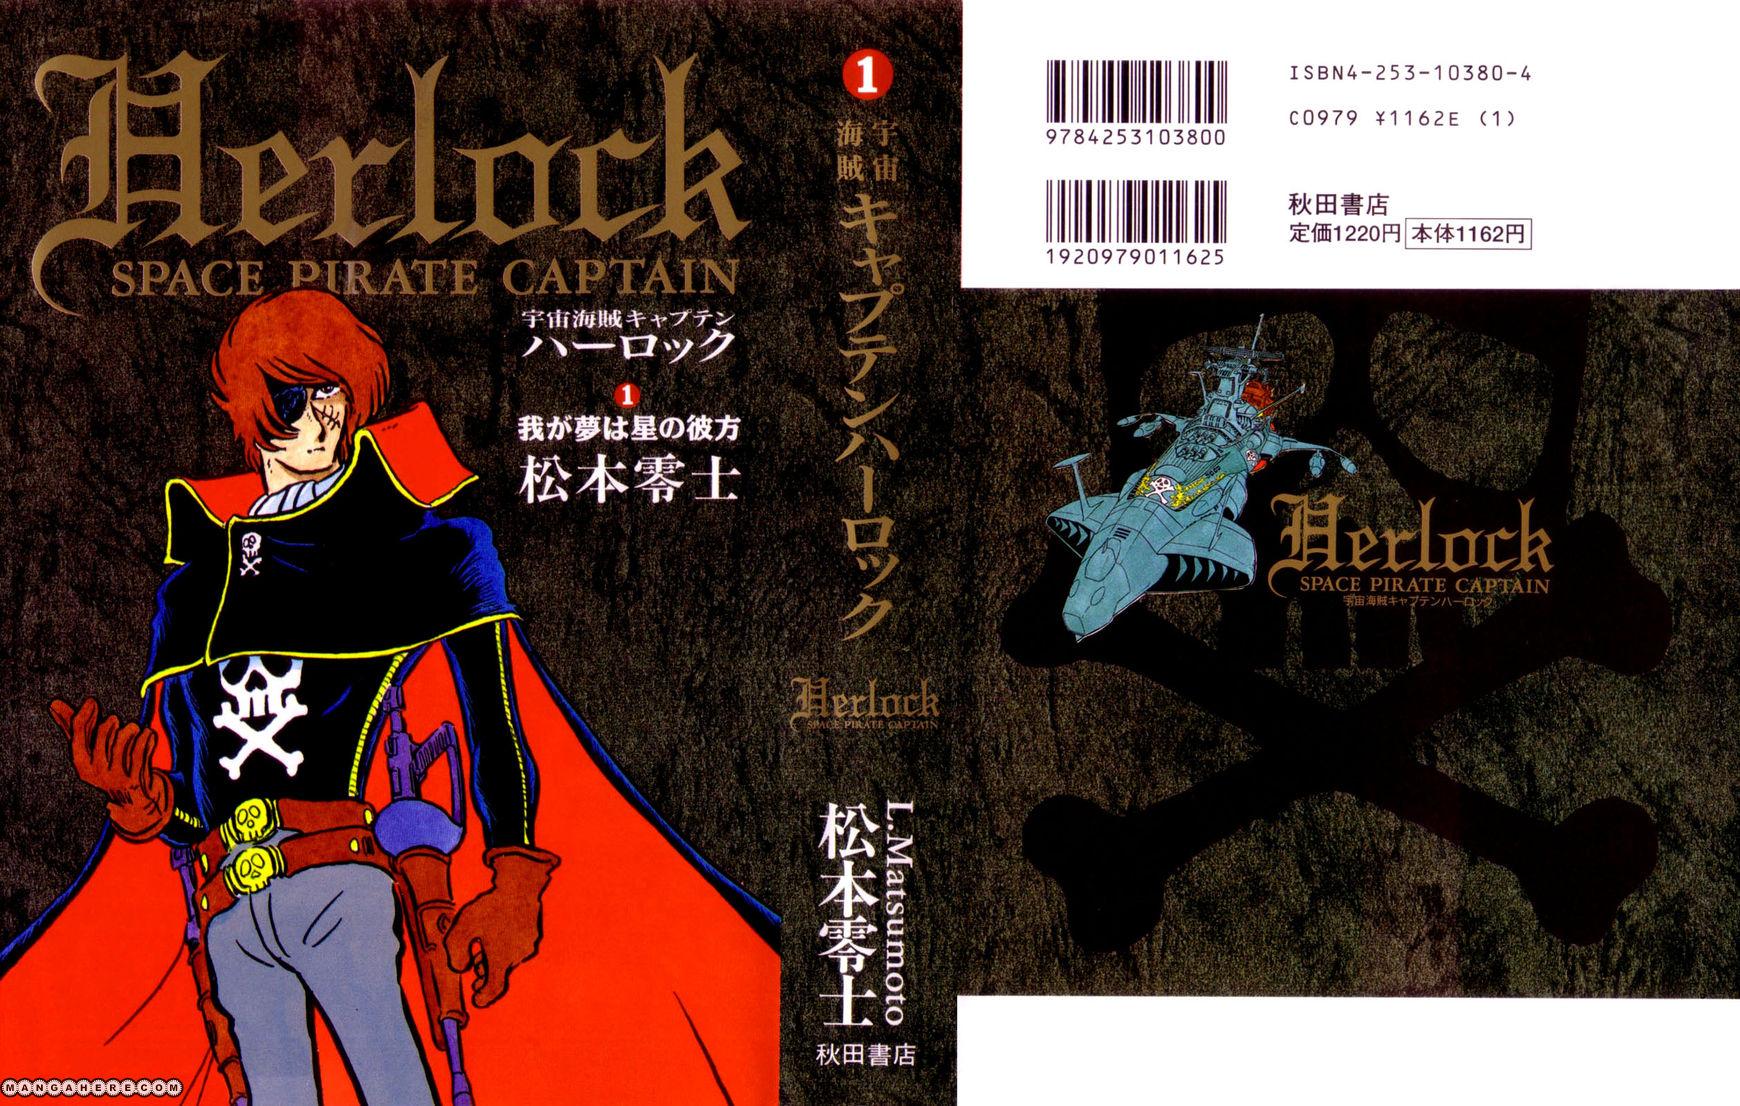 Uchuu Kaizoku Captain Harlock 1 Page 1